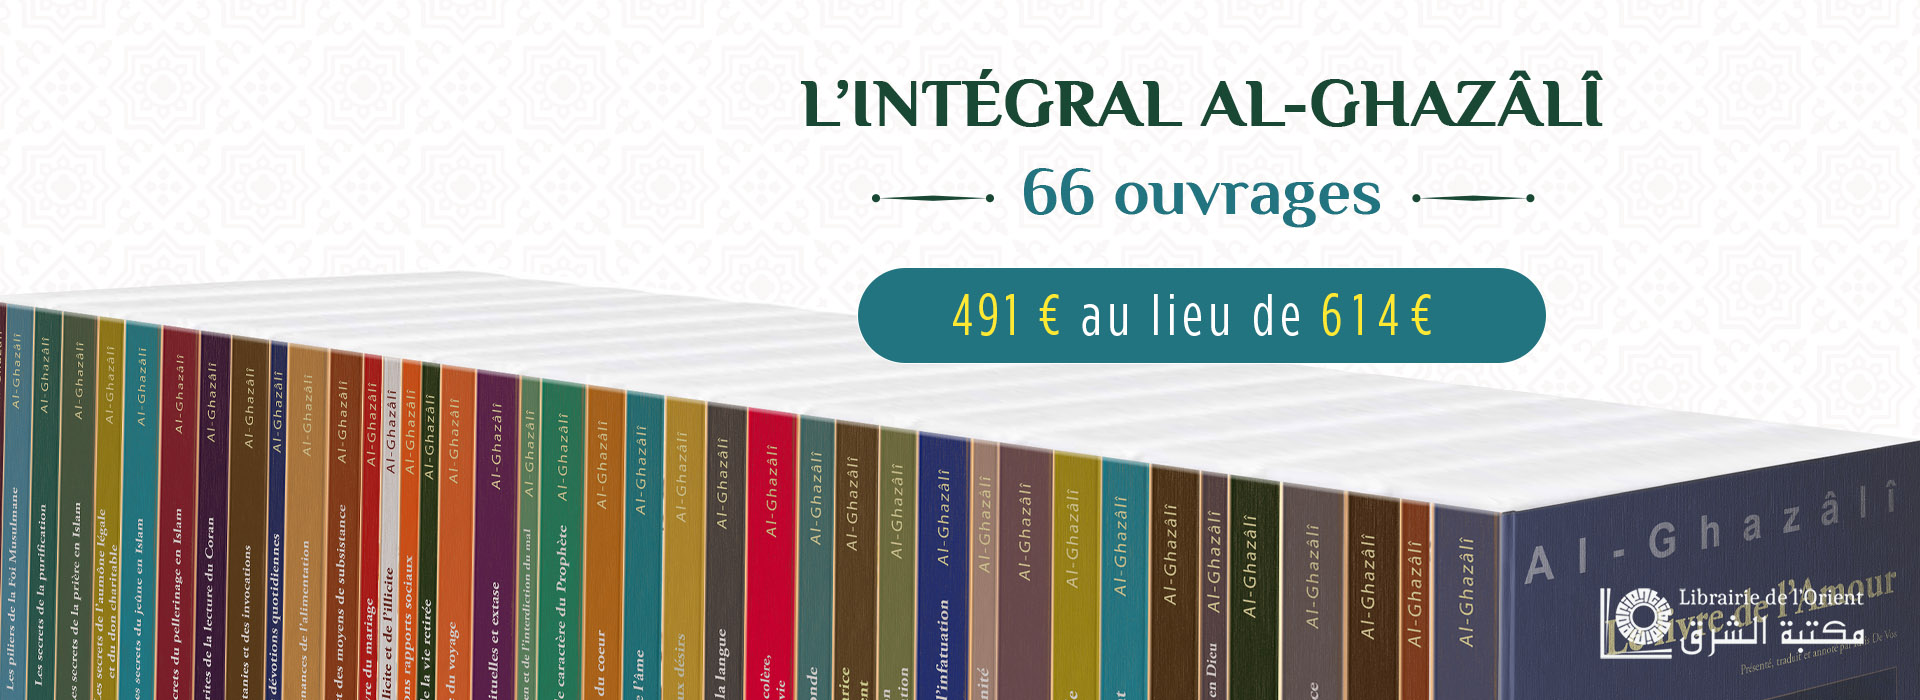 coffret intégral al-ghazali